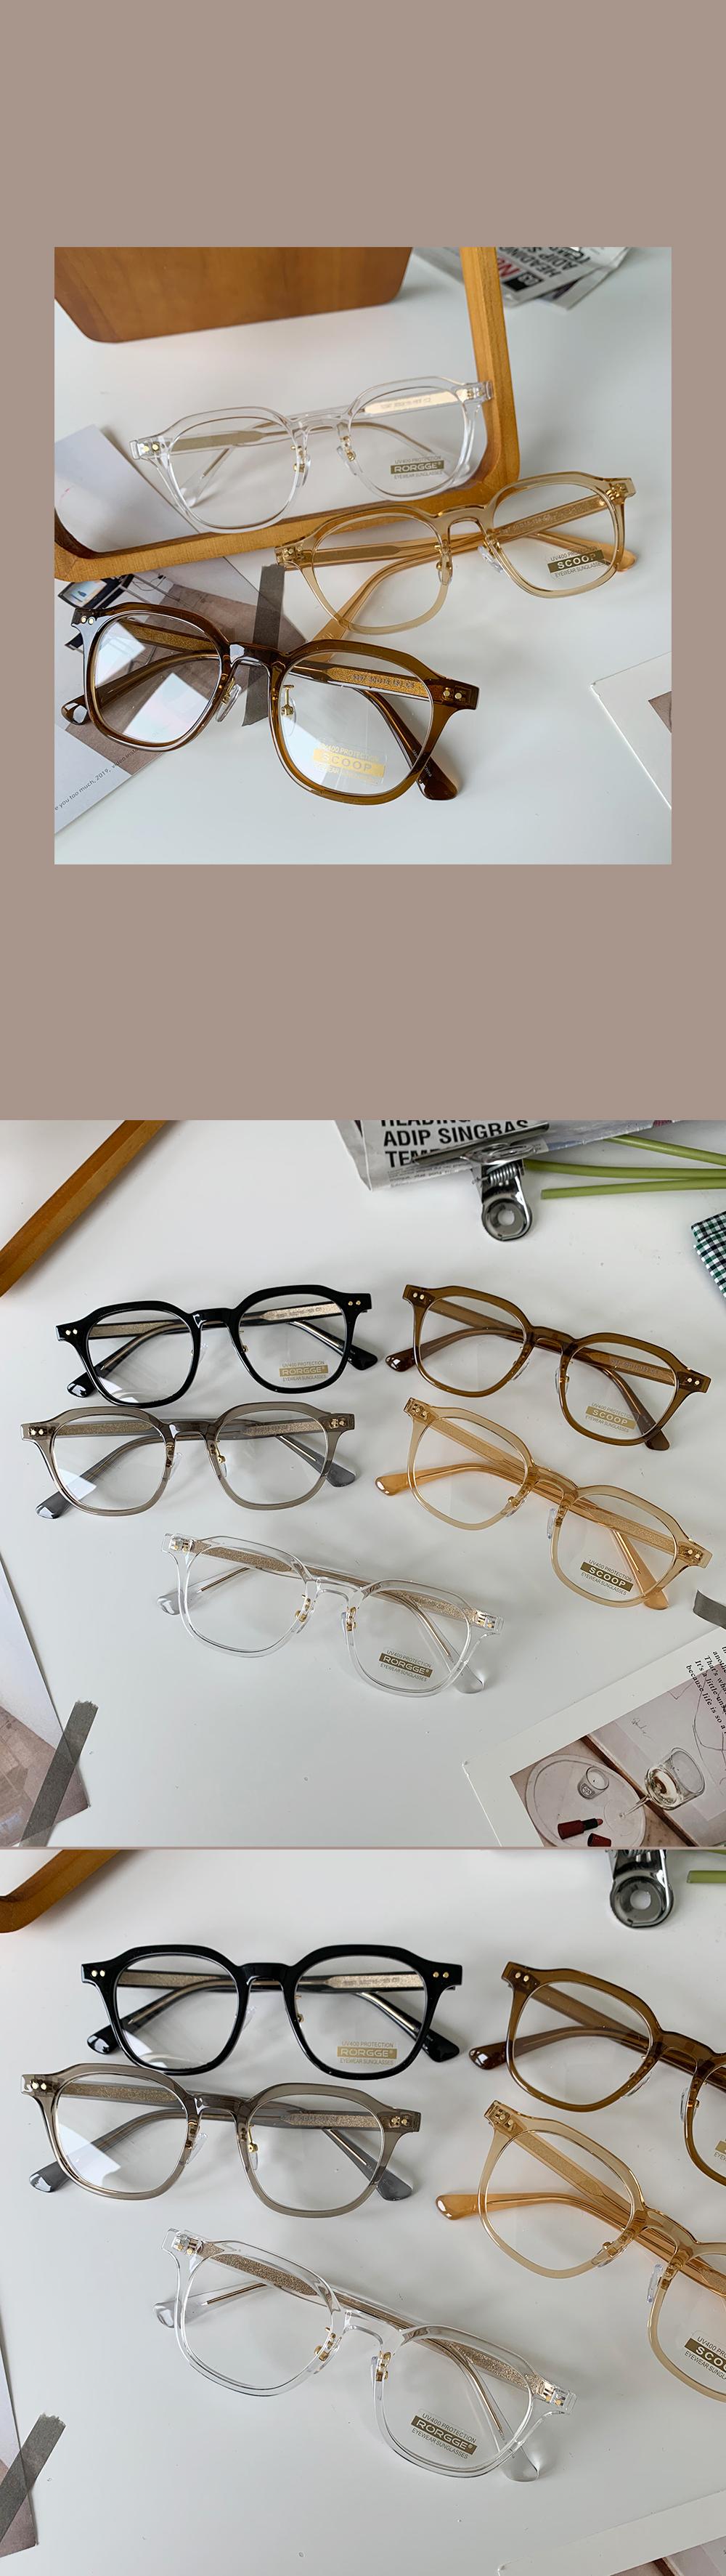 Transparent fashion glasses